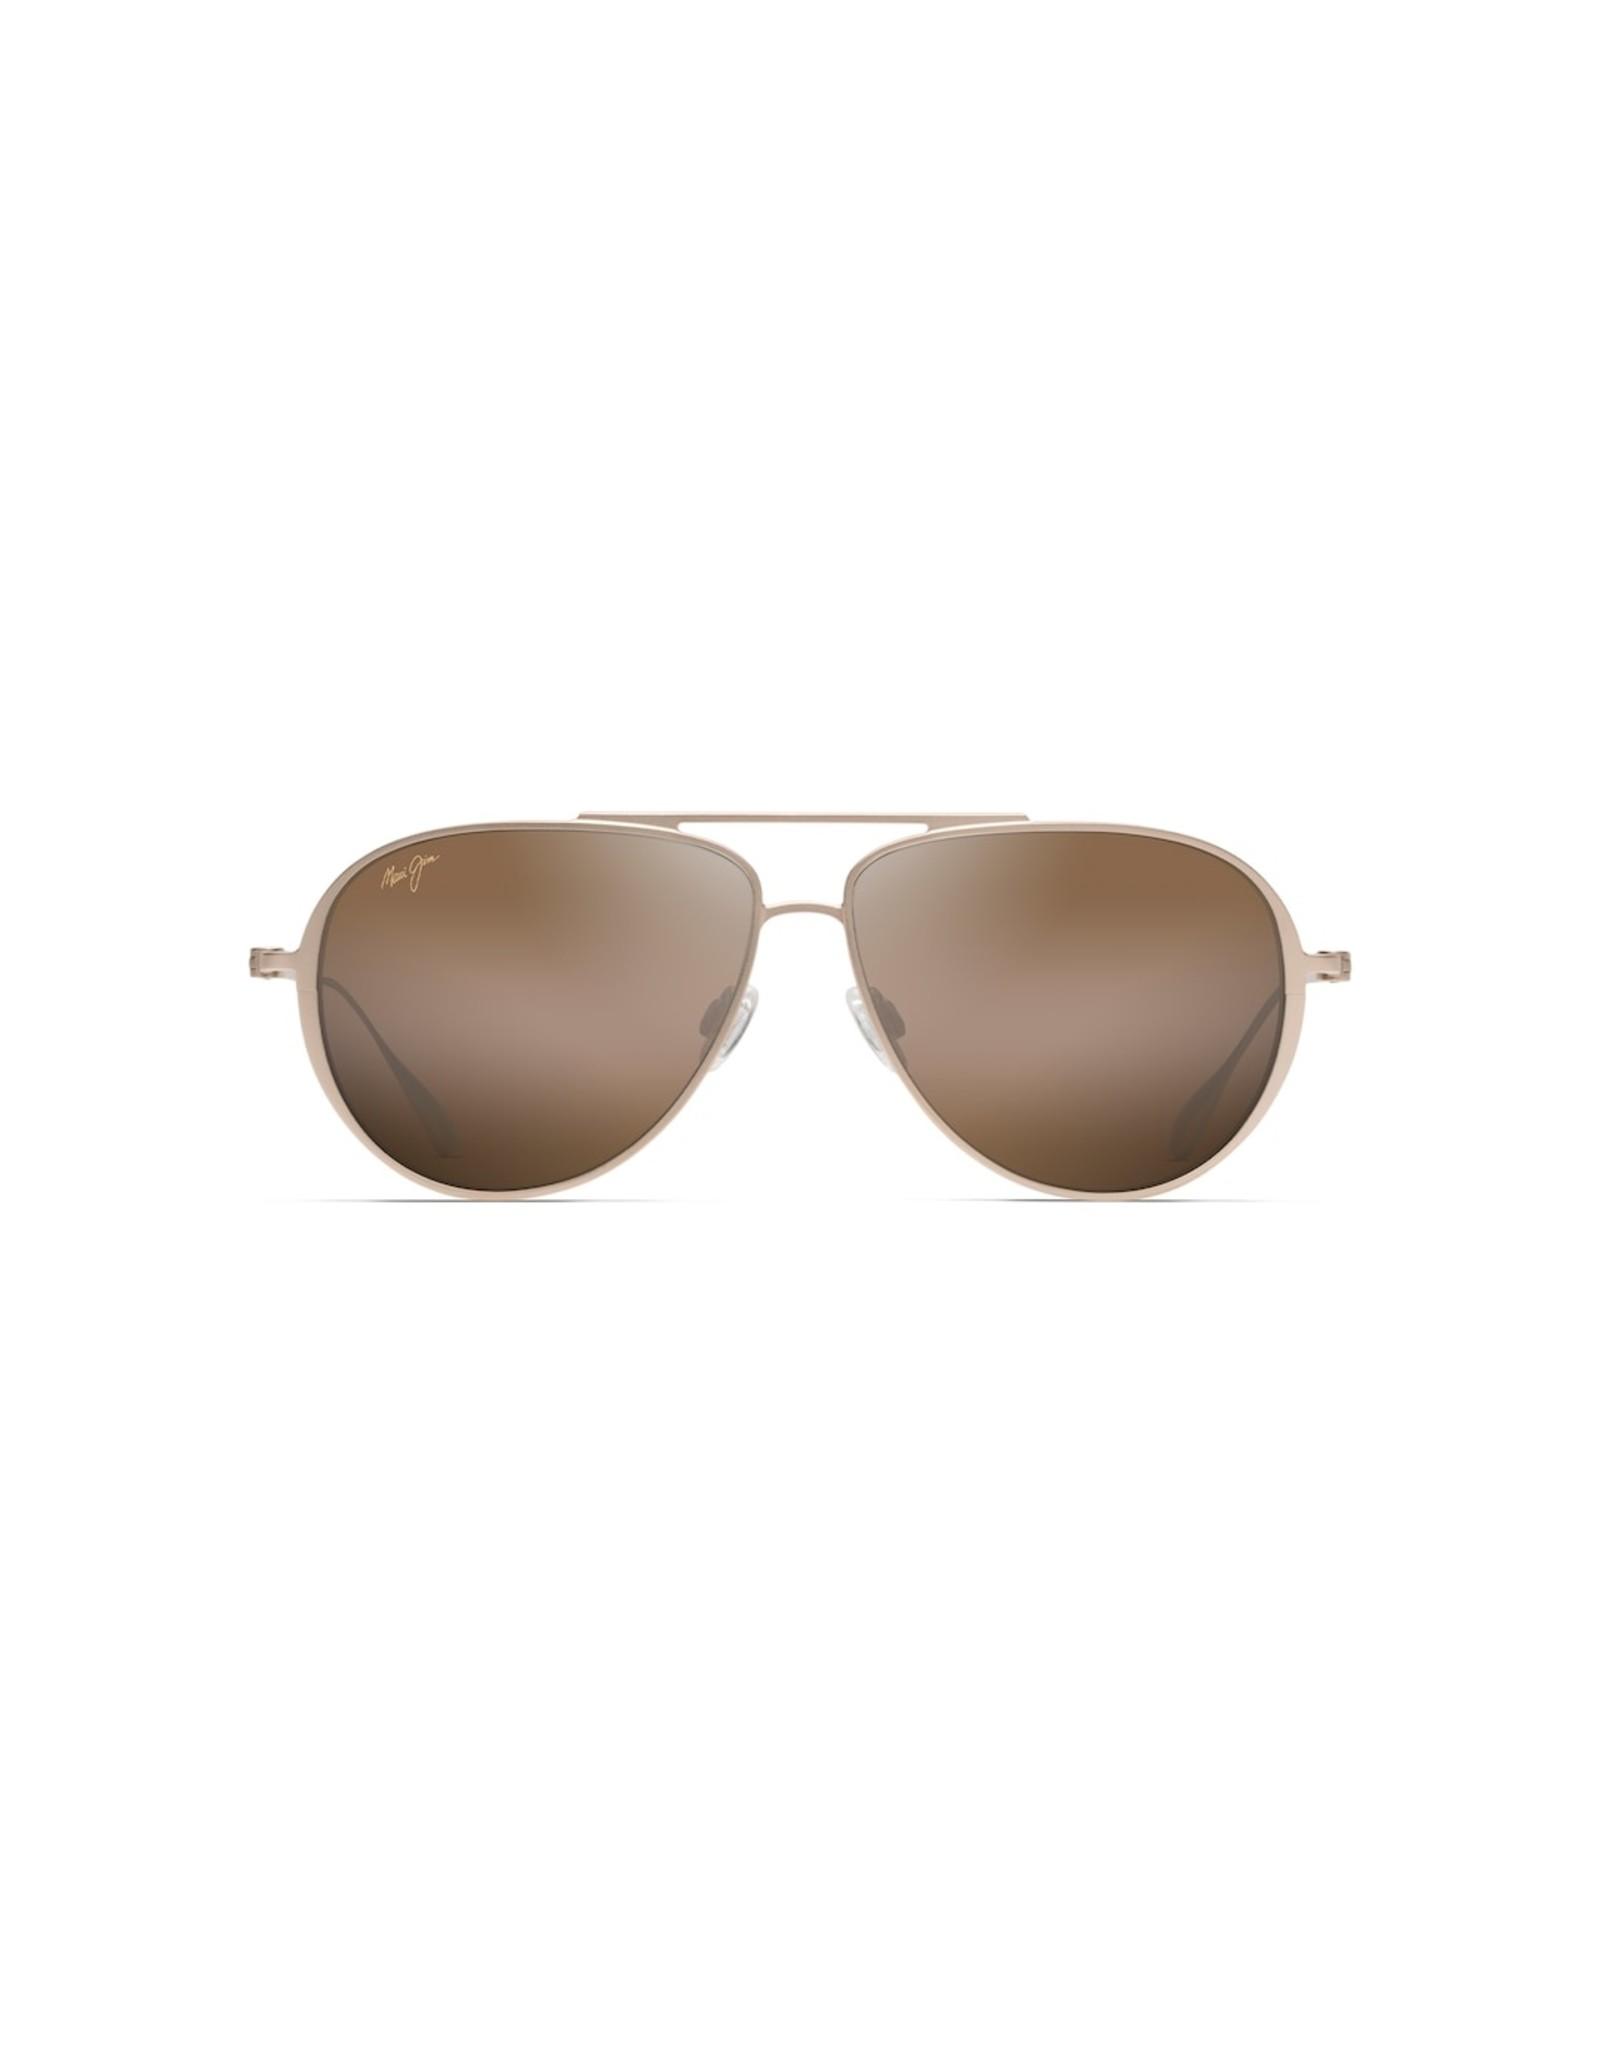 Maui Jim Maui Jim 'Shallows' Sunglasses